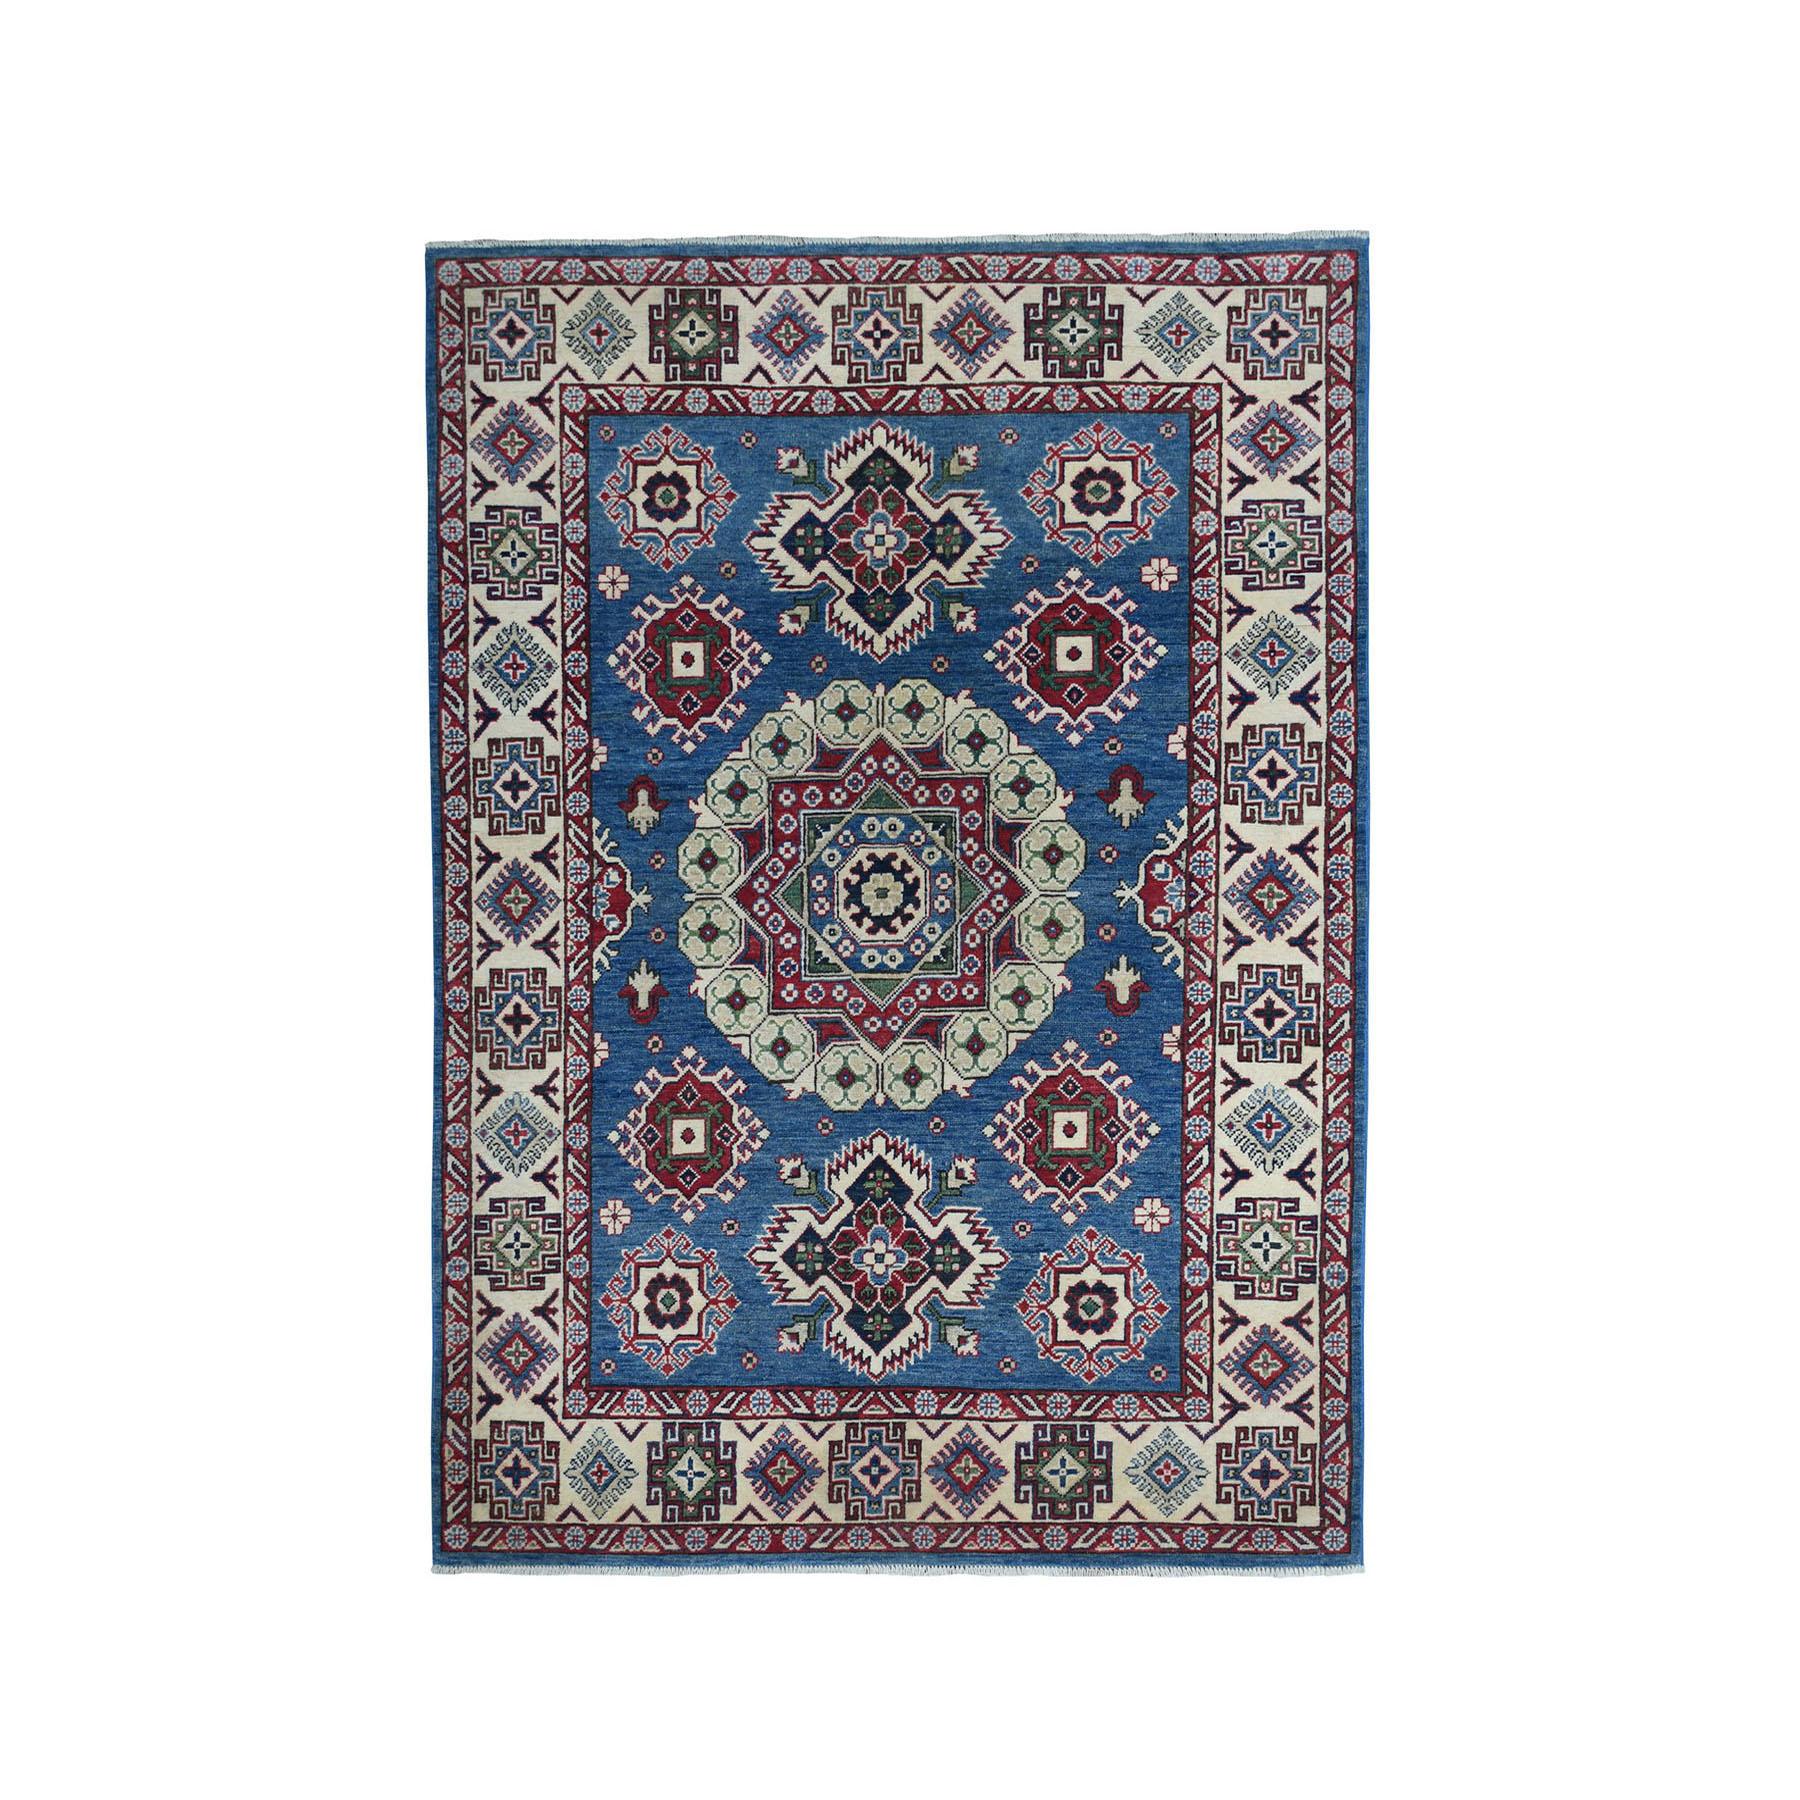 "5'X6'10"" Blue Kazak Geometric Design Pure Wool Hand-Knotted Oriental Rug moae077e"